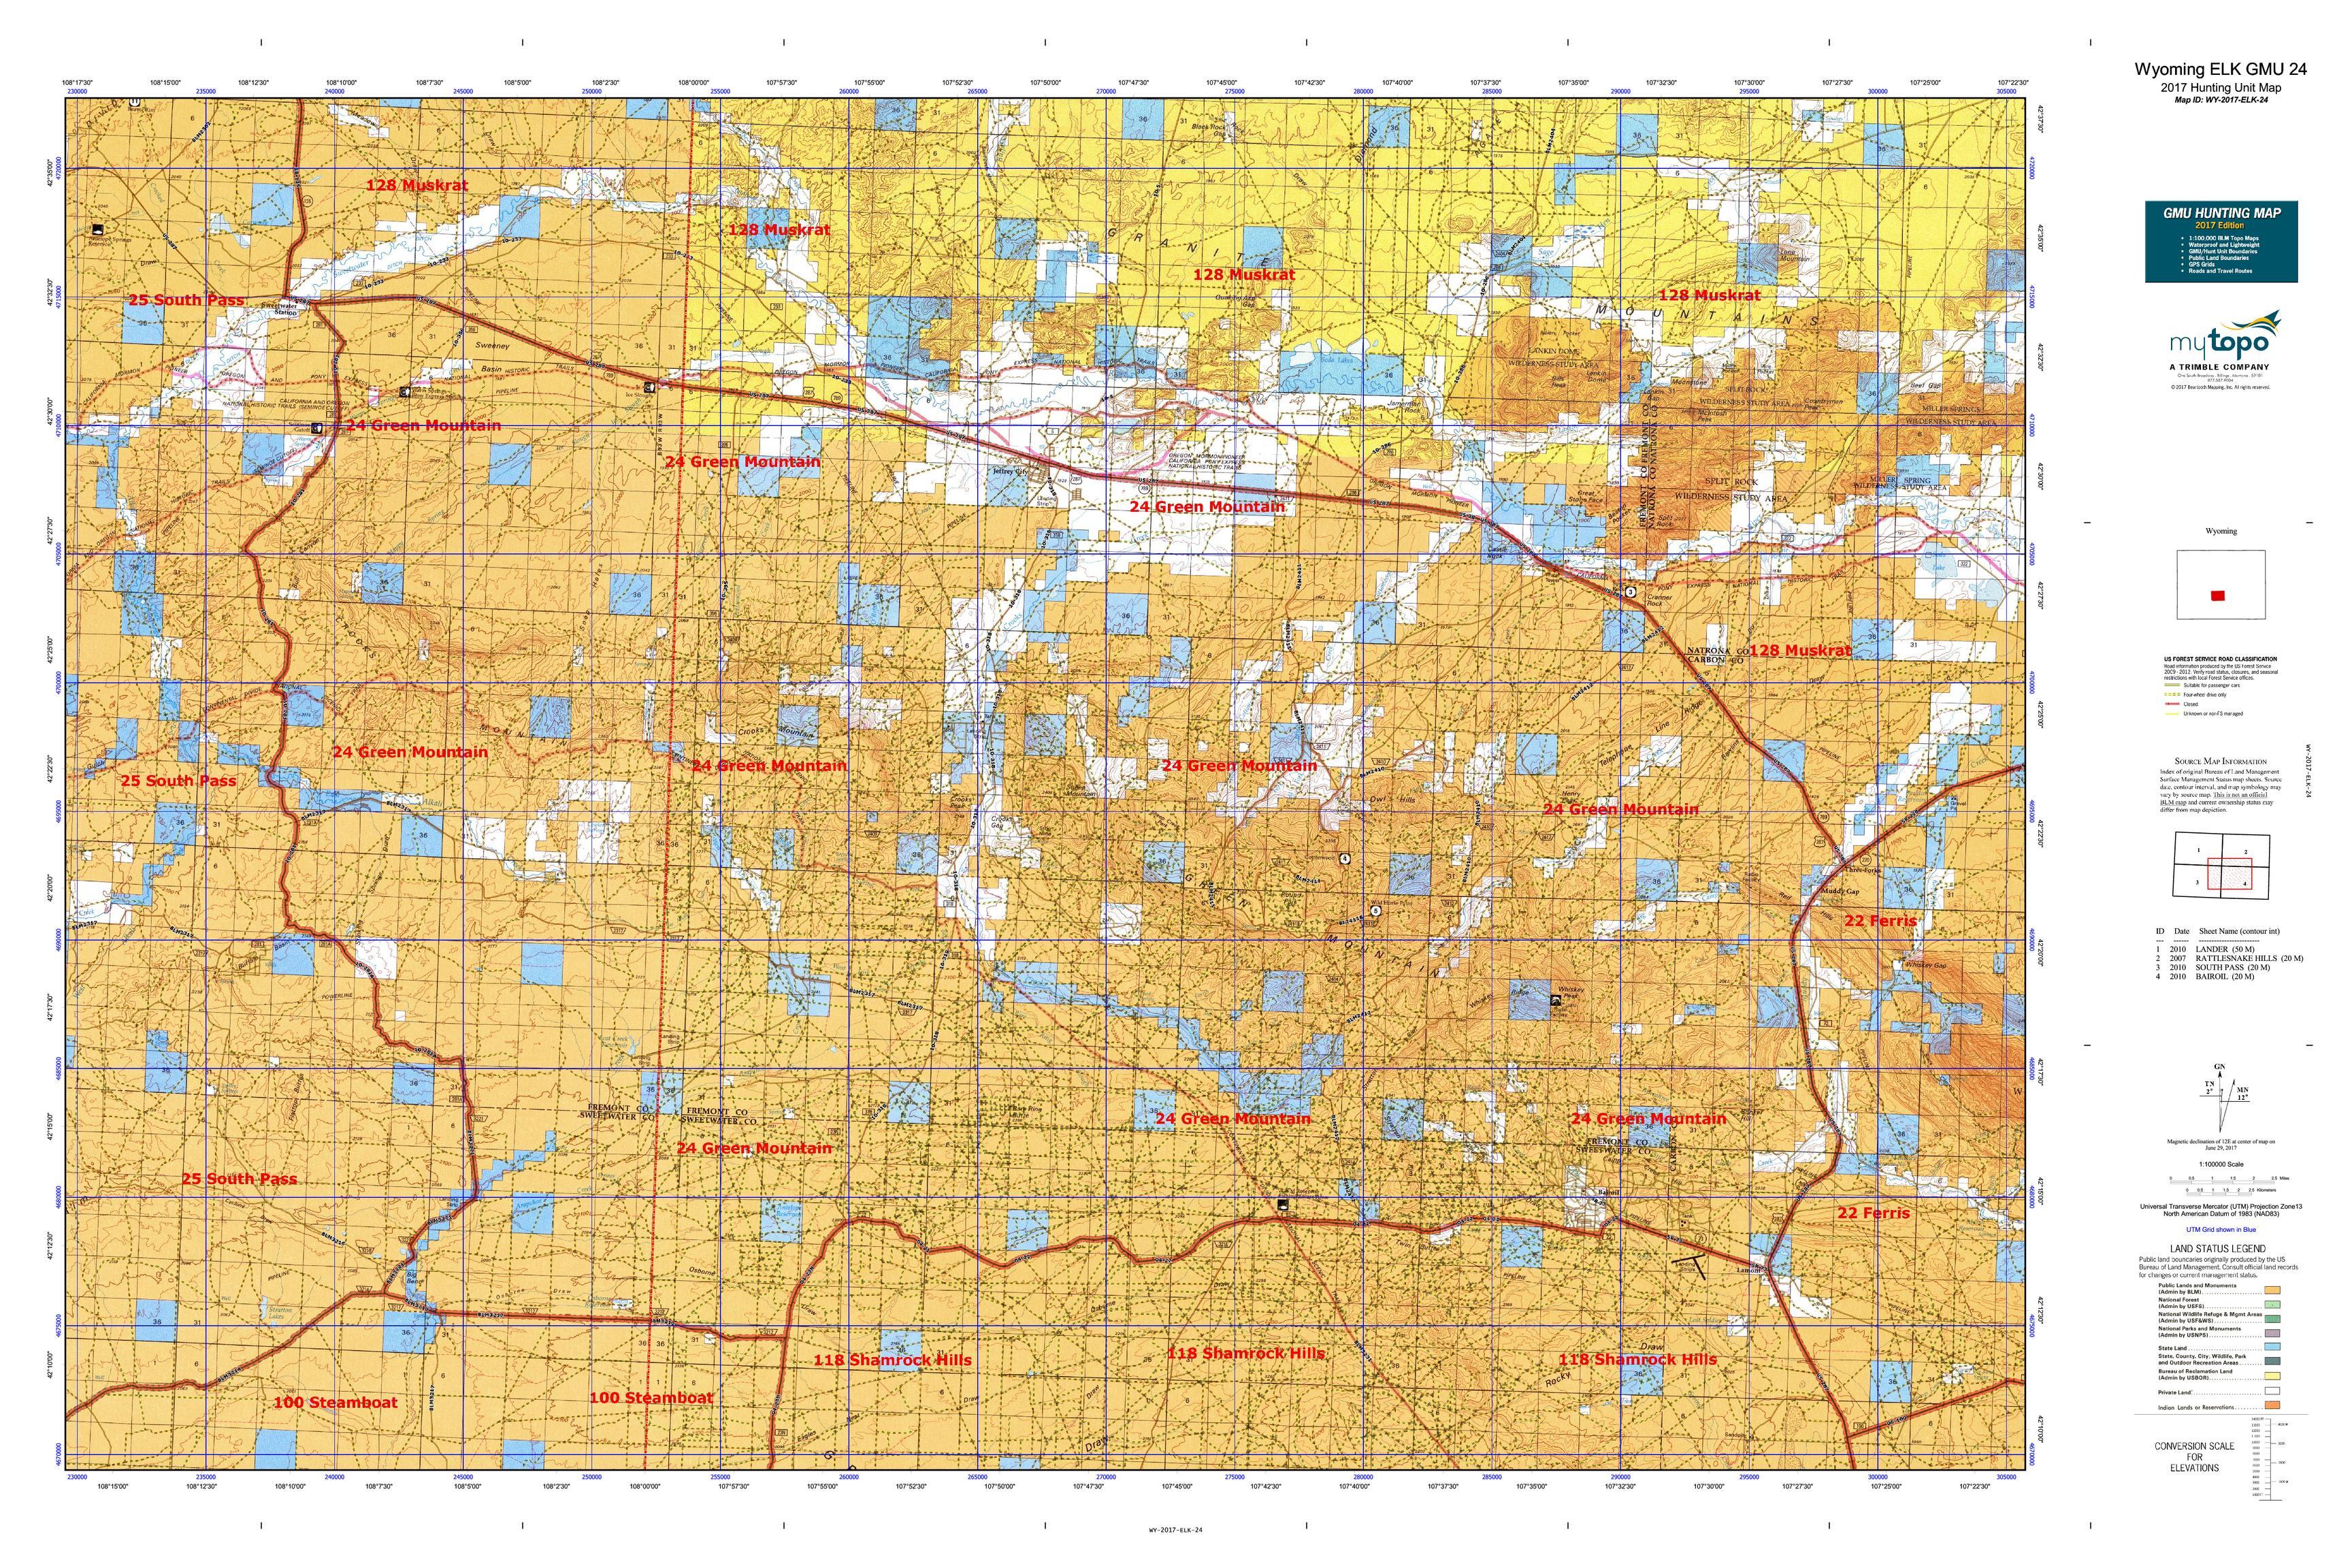 Wyoming ELK GMU Map MyTopo - Wy map